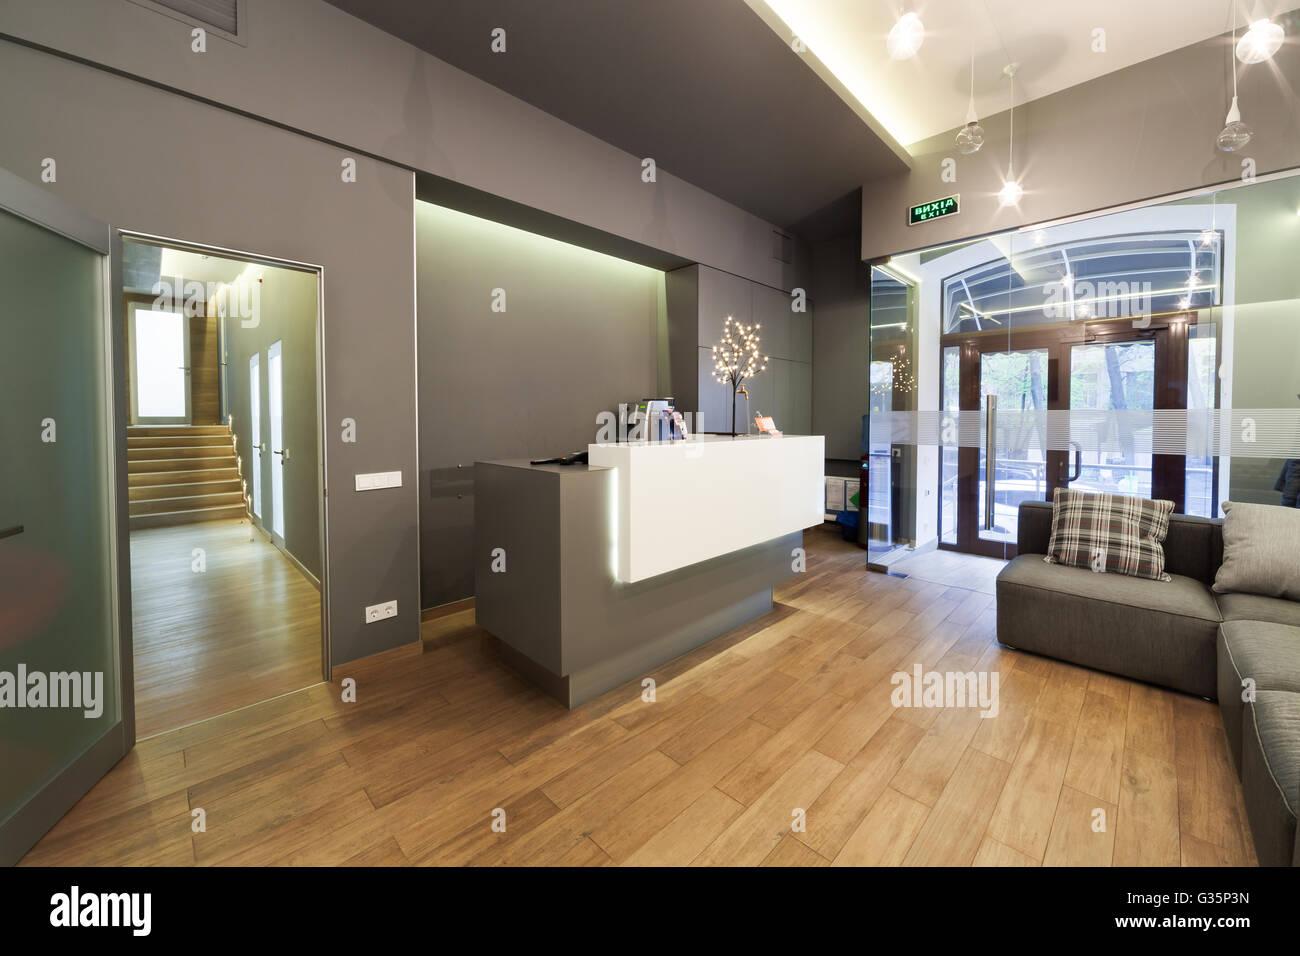 Moderne Innenarchitektur. Lobby-dental clinic Stockfoto, Bild ...